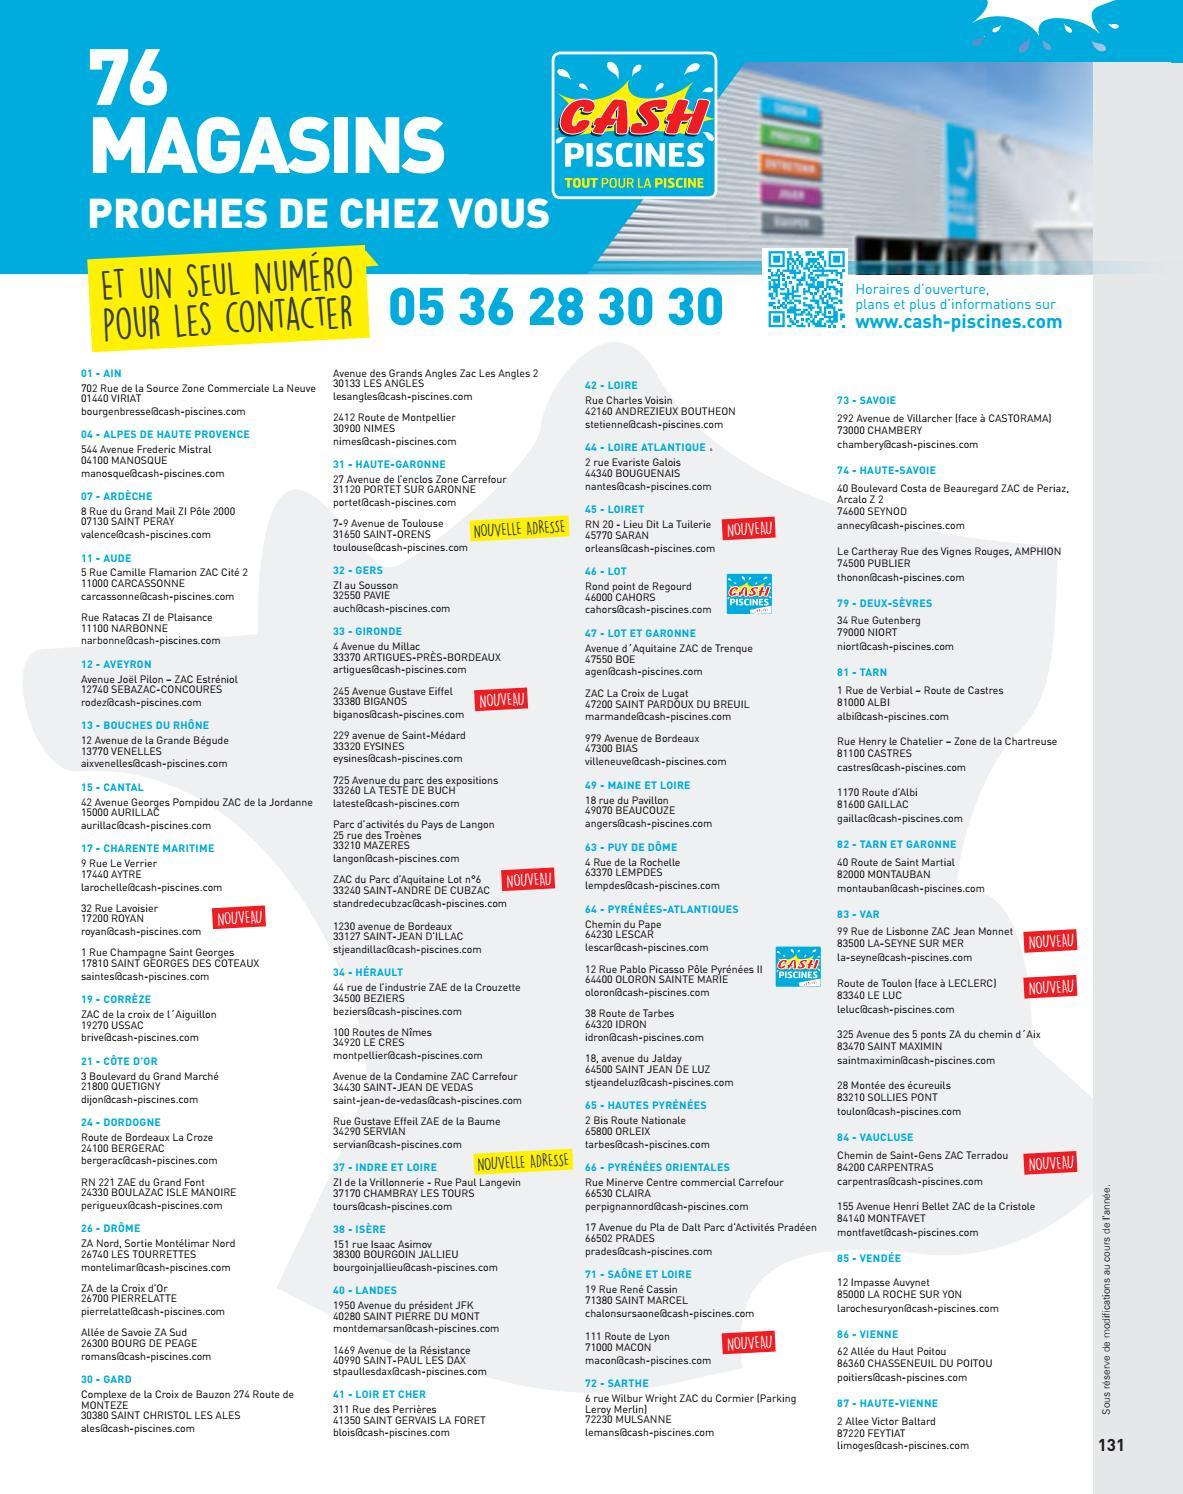 Catalogue Cash Piscine 2018 By Octave Octave - Issuu concernant Cash Piscine Sollies Pont